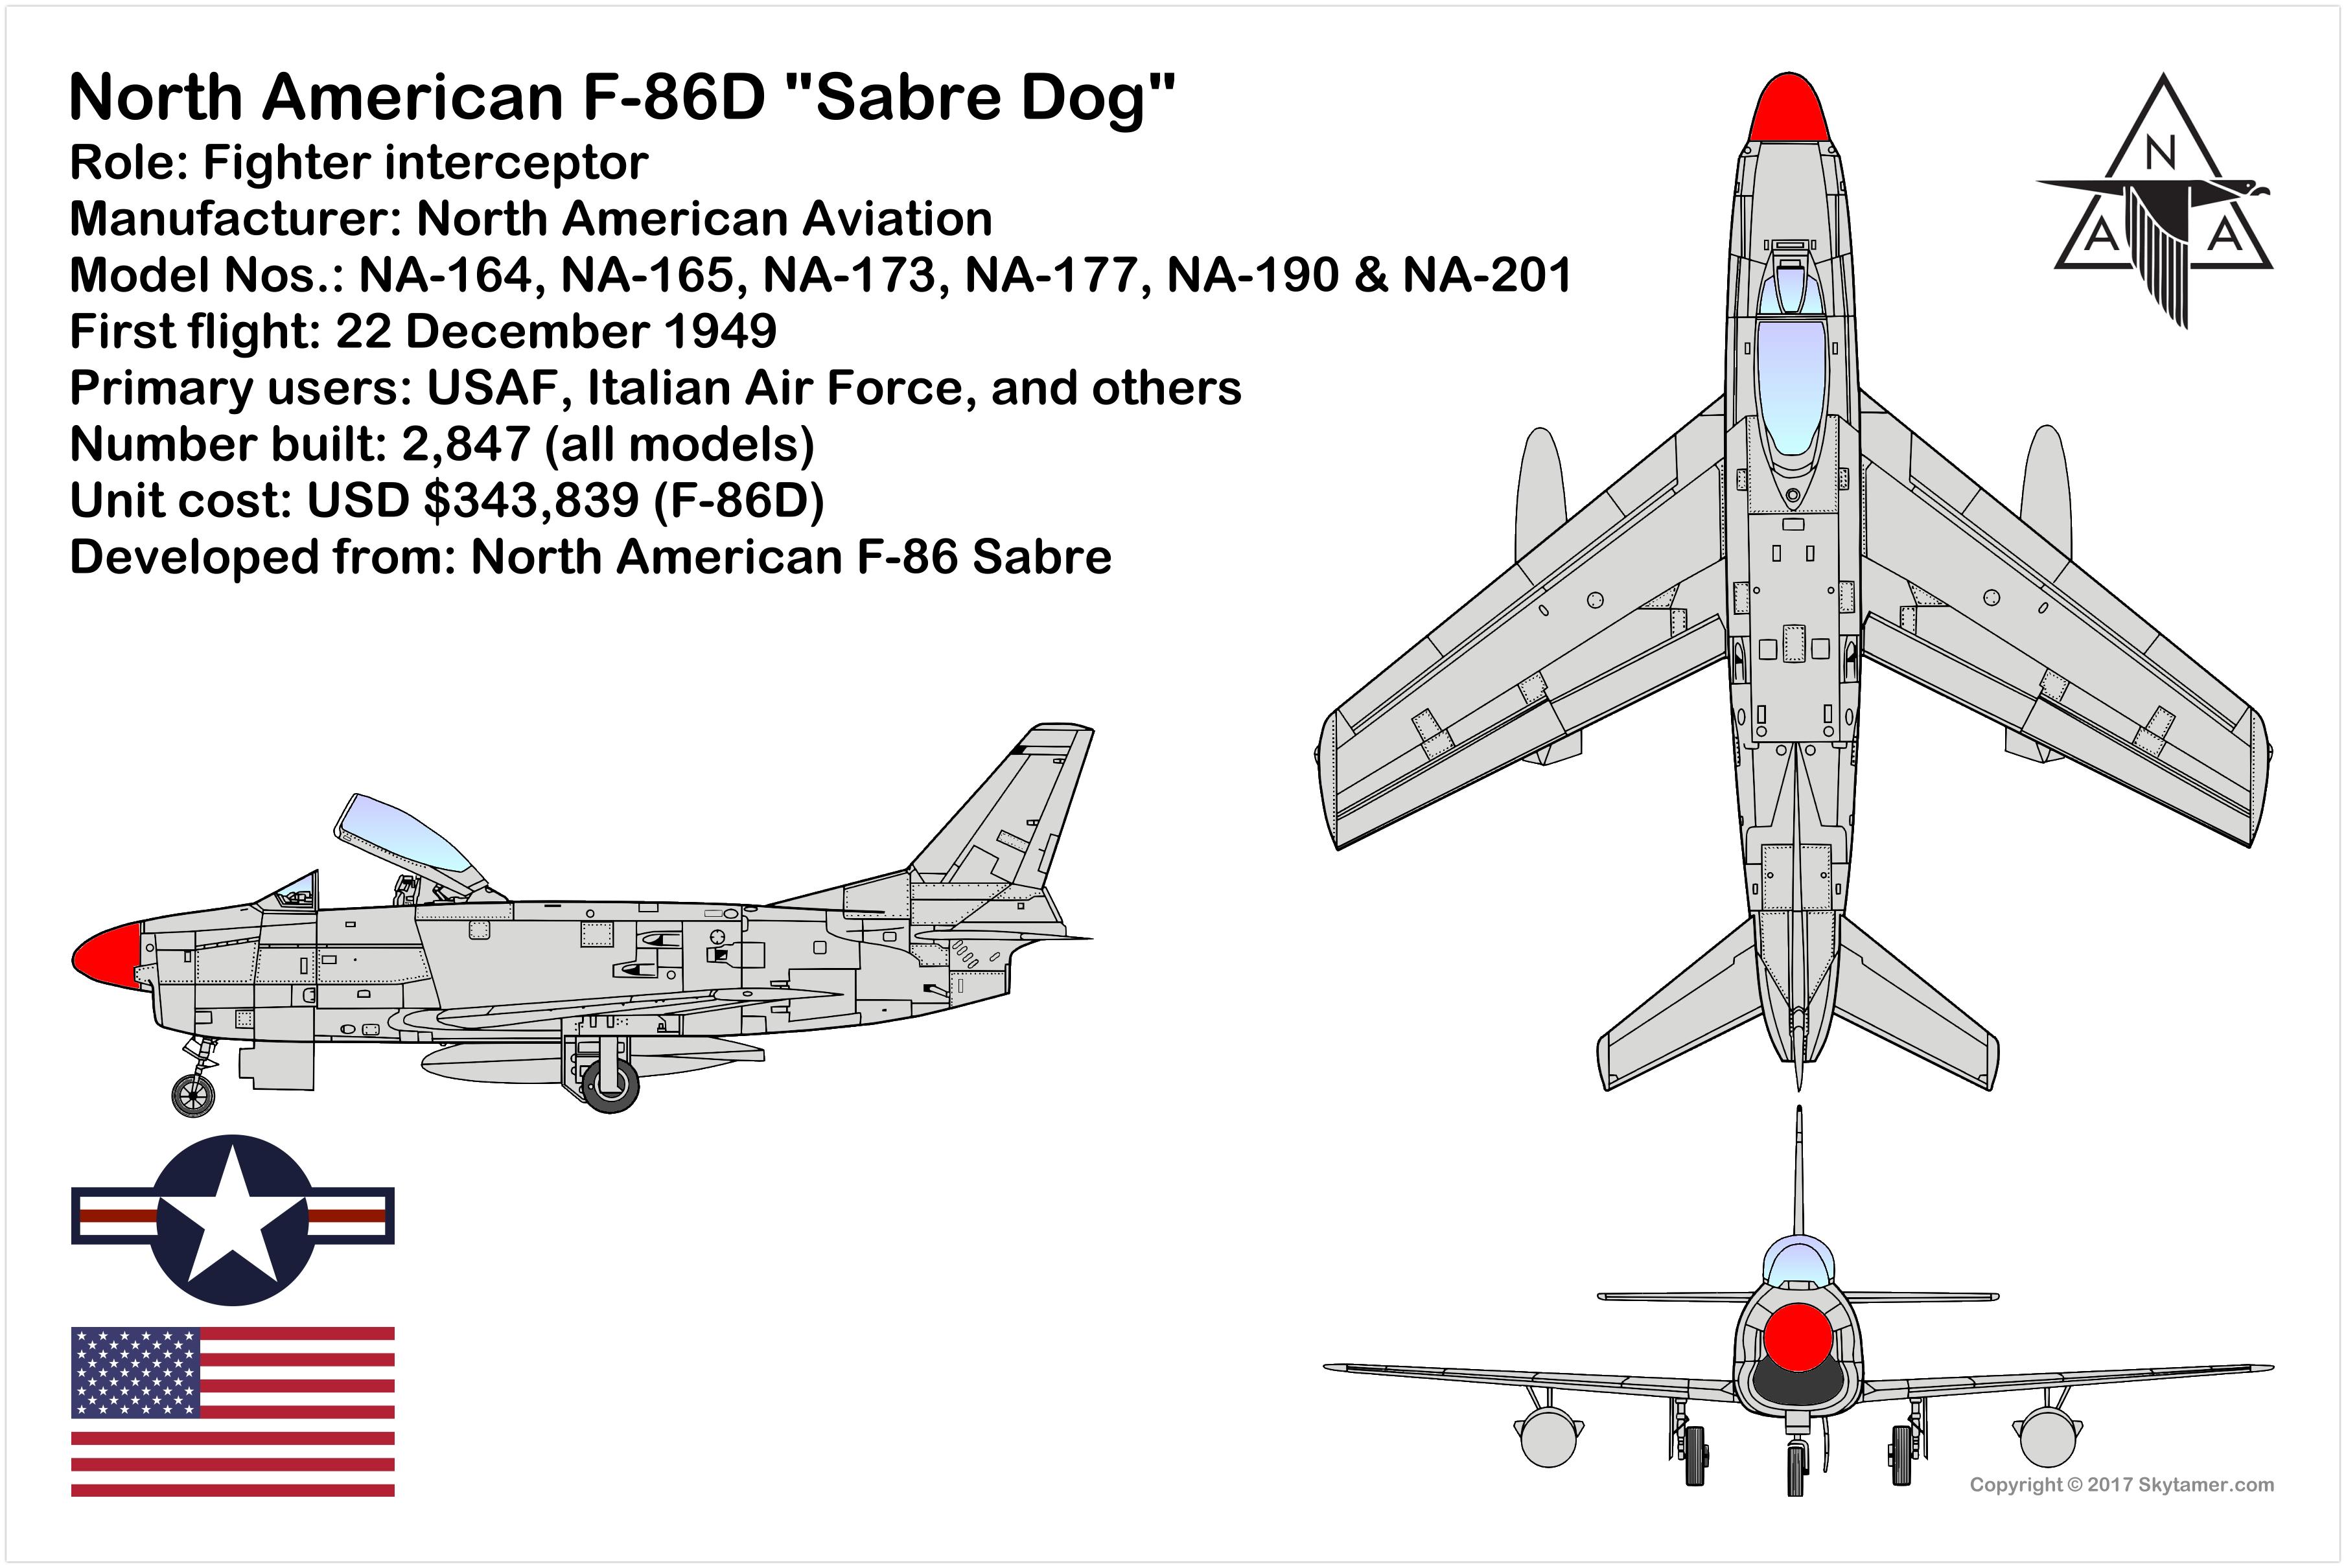 North American F-86D Sabre Dog, Single-engine single-seat